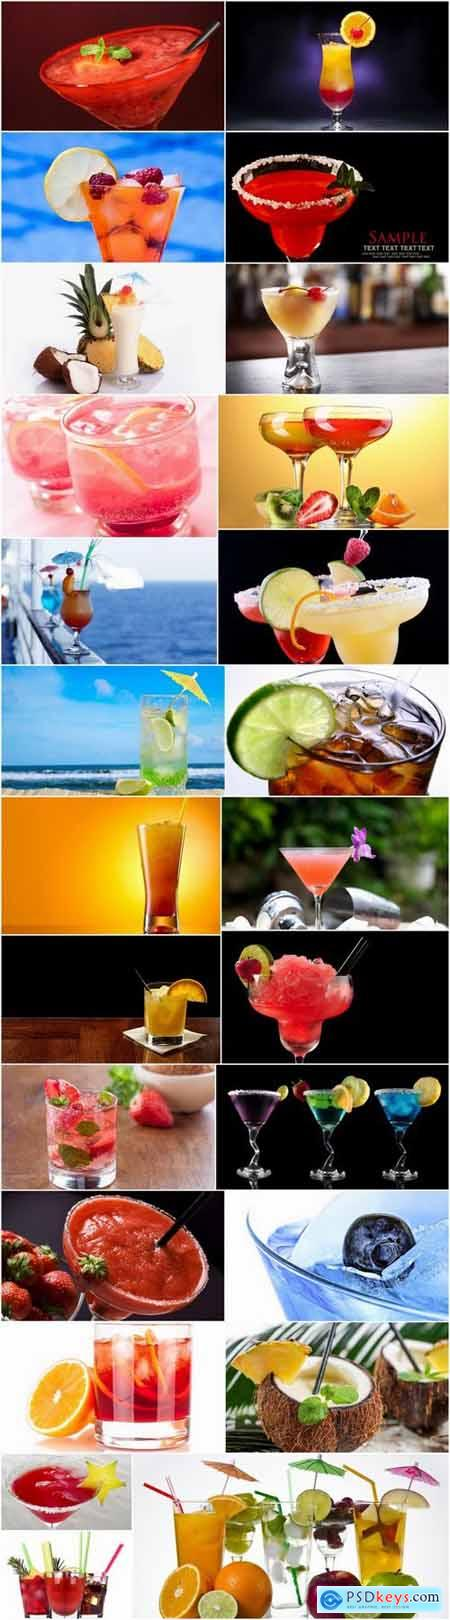 Cocktail 25 HQ Jpeg